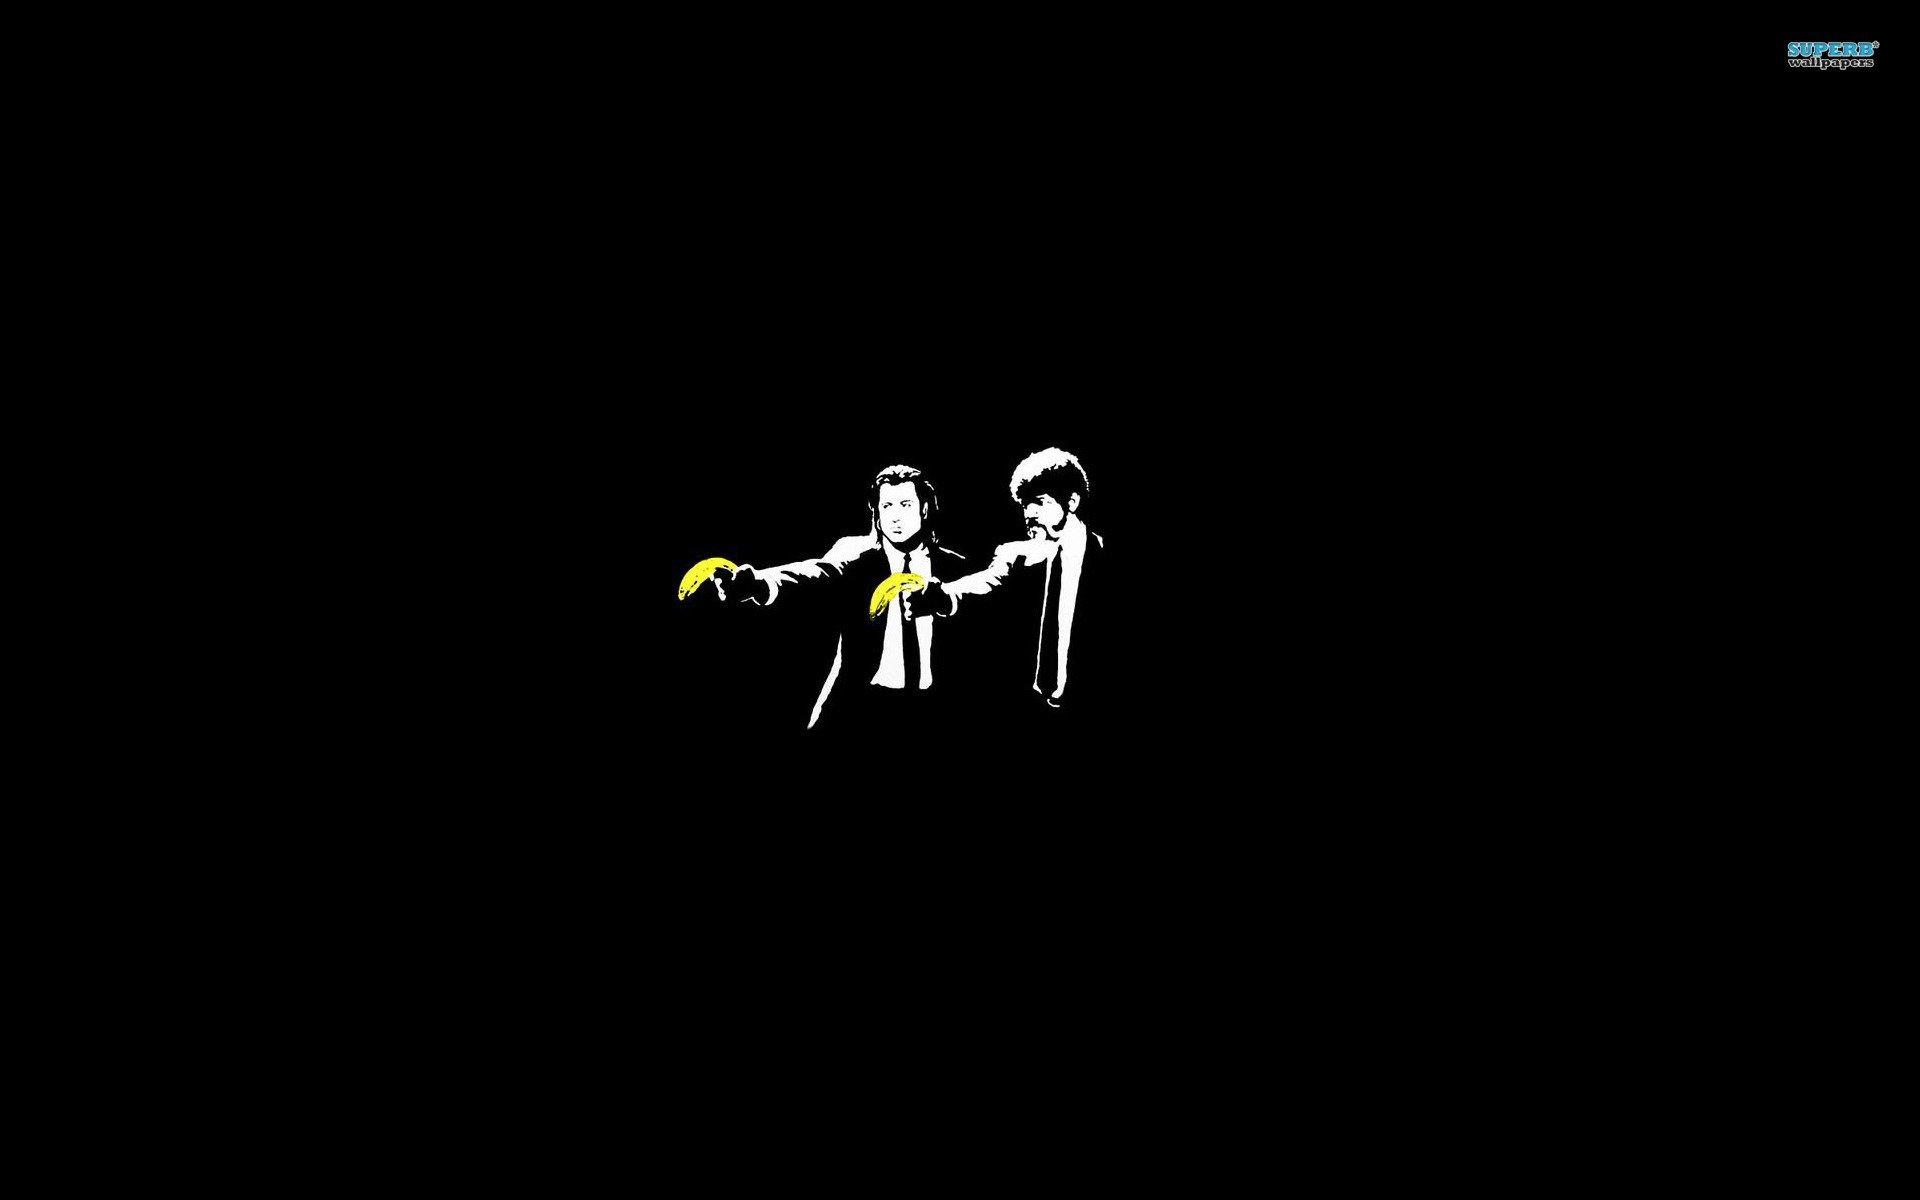 6564-banana-pulp-fiction.jpg - -